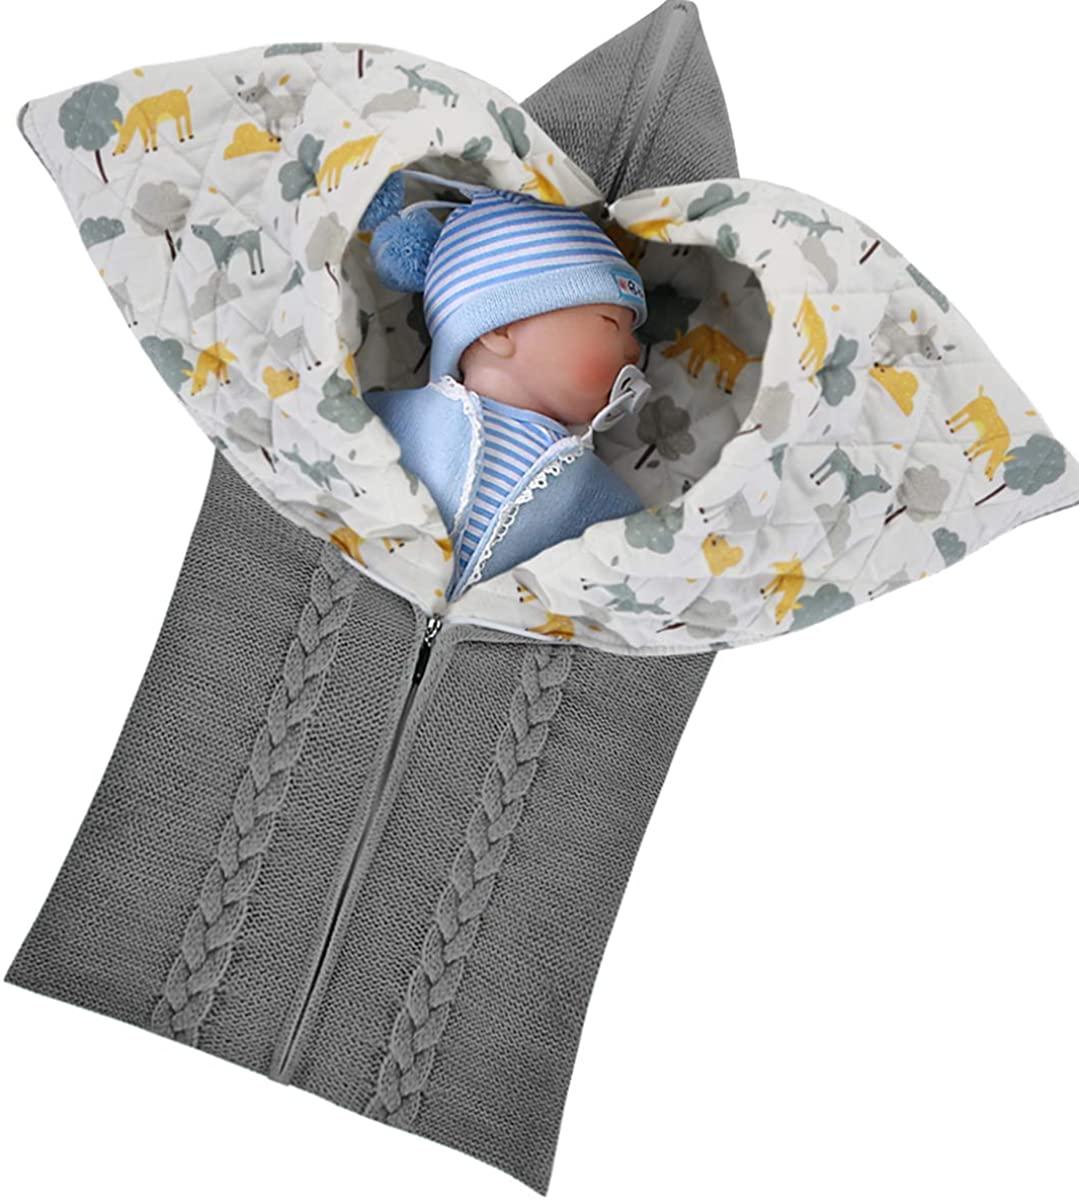 topseller-hzy Newborn Knitted Sleeping Bag Baby Stroller Wrapped Walker Thickened Warm Sleeping Bag